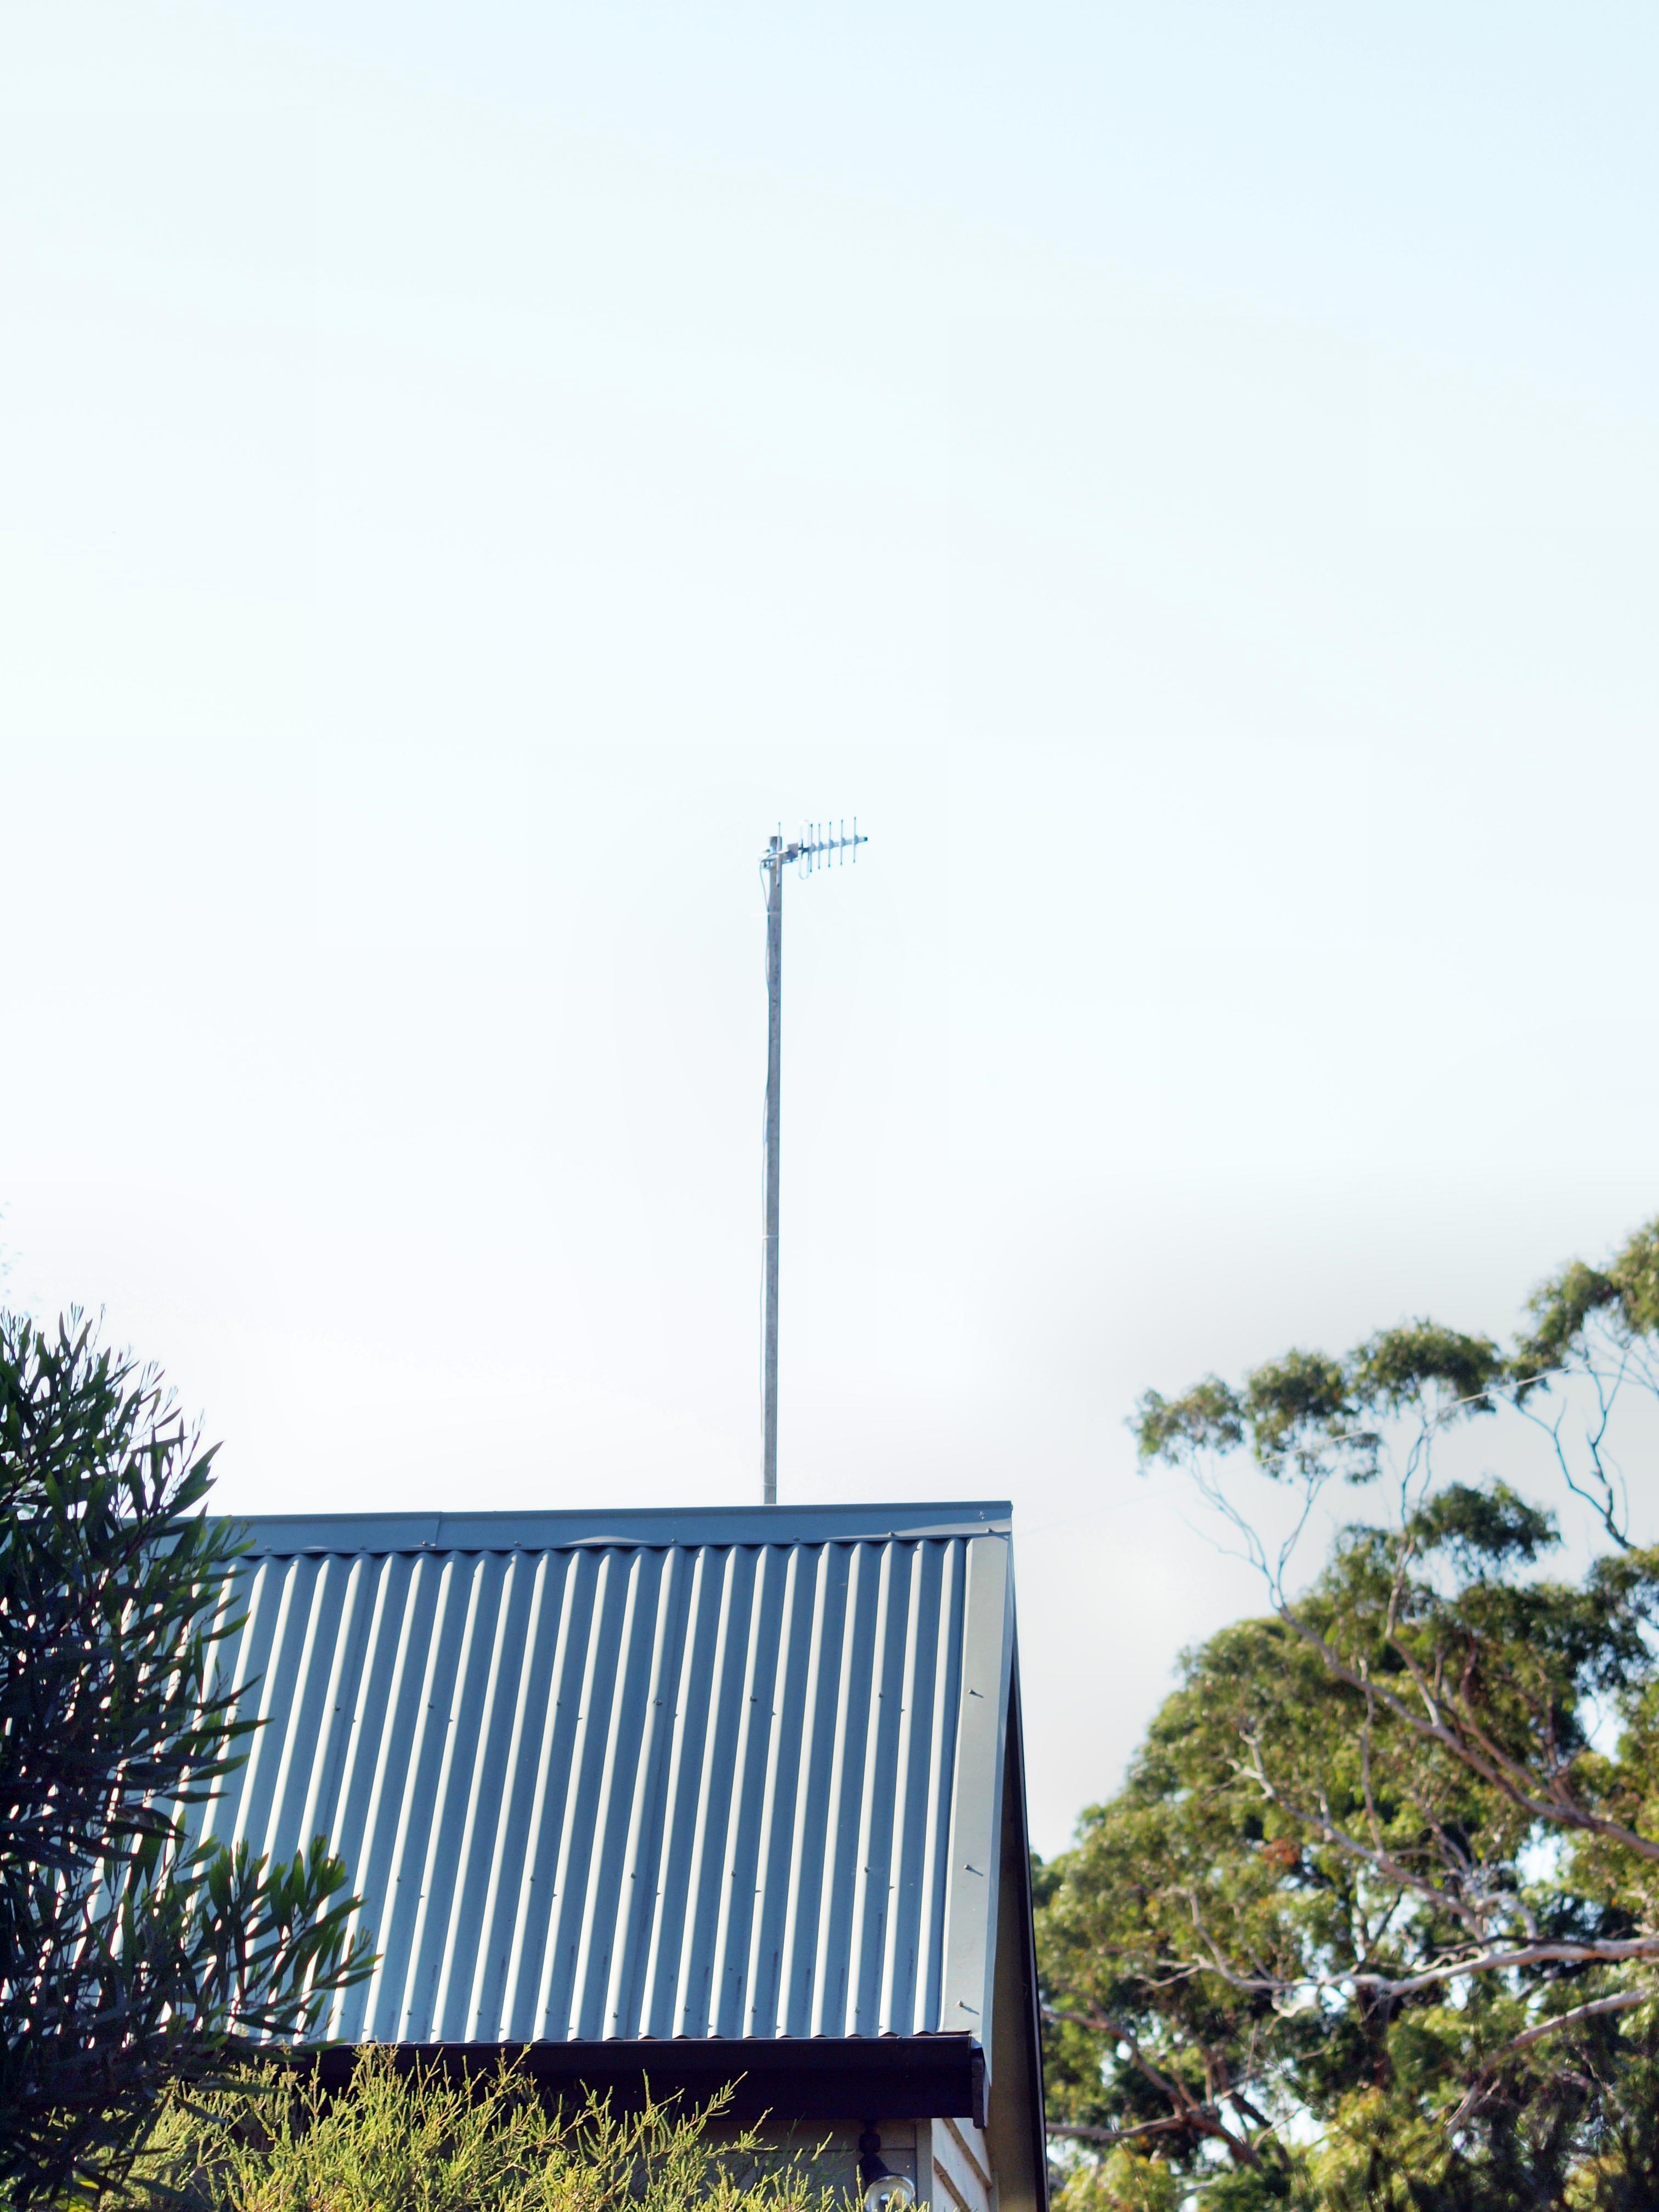 Microwave-radiation-tower-1.jpeg